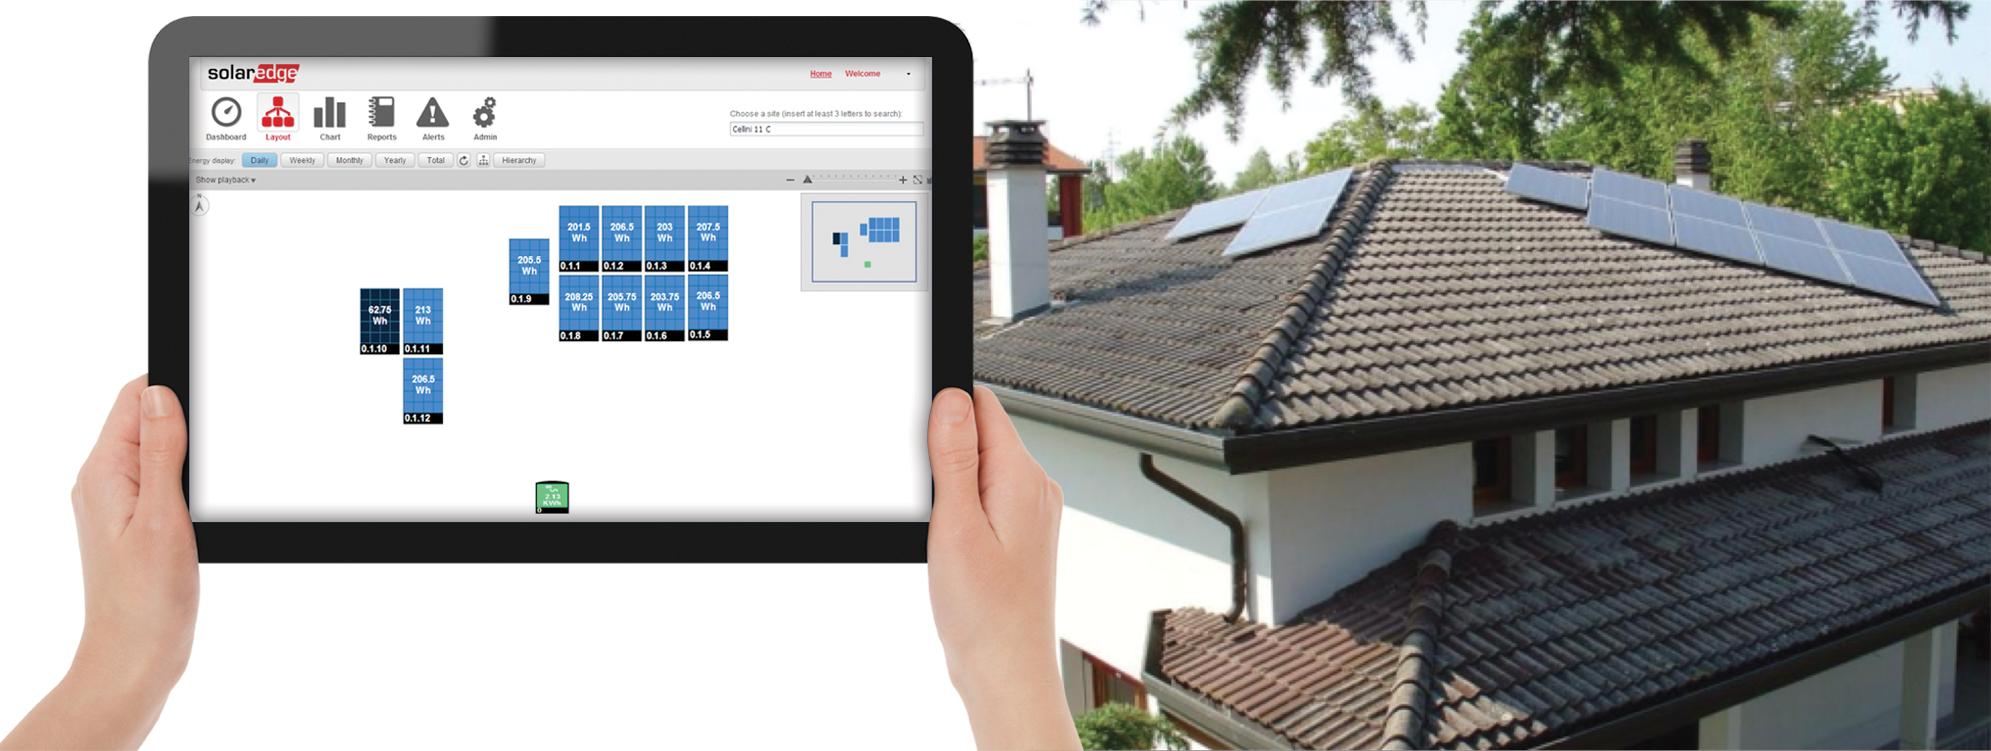 SolarEdge House-monitoring